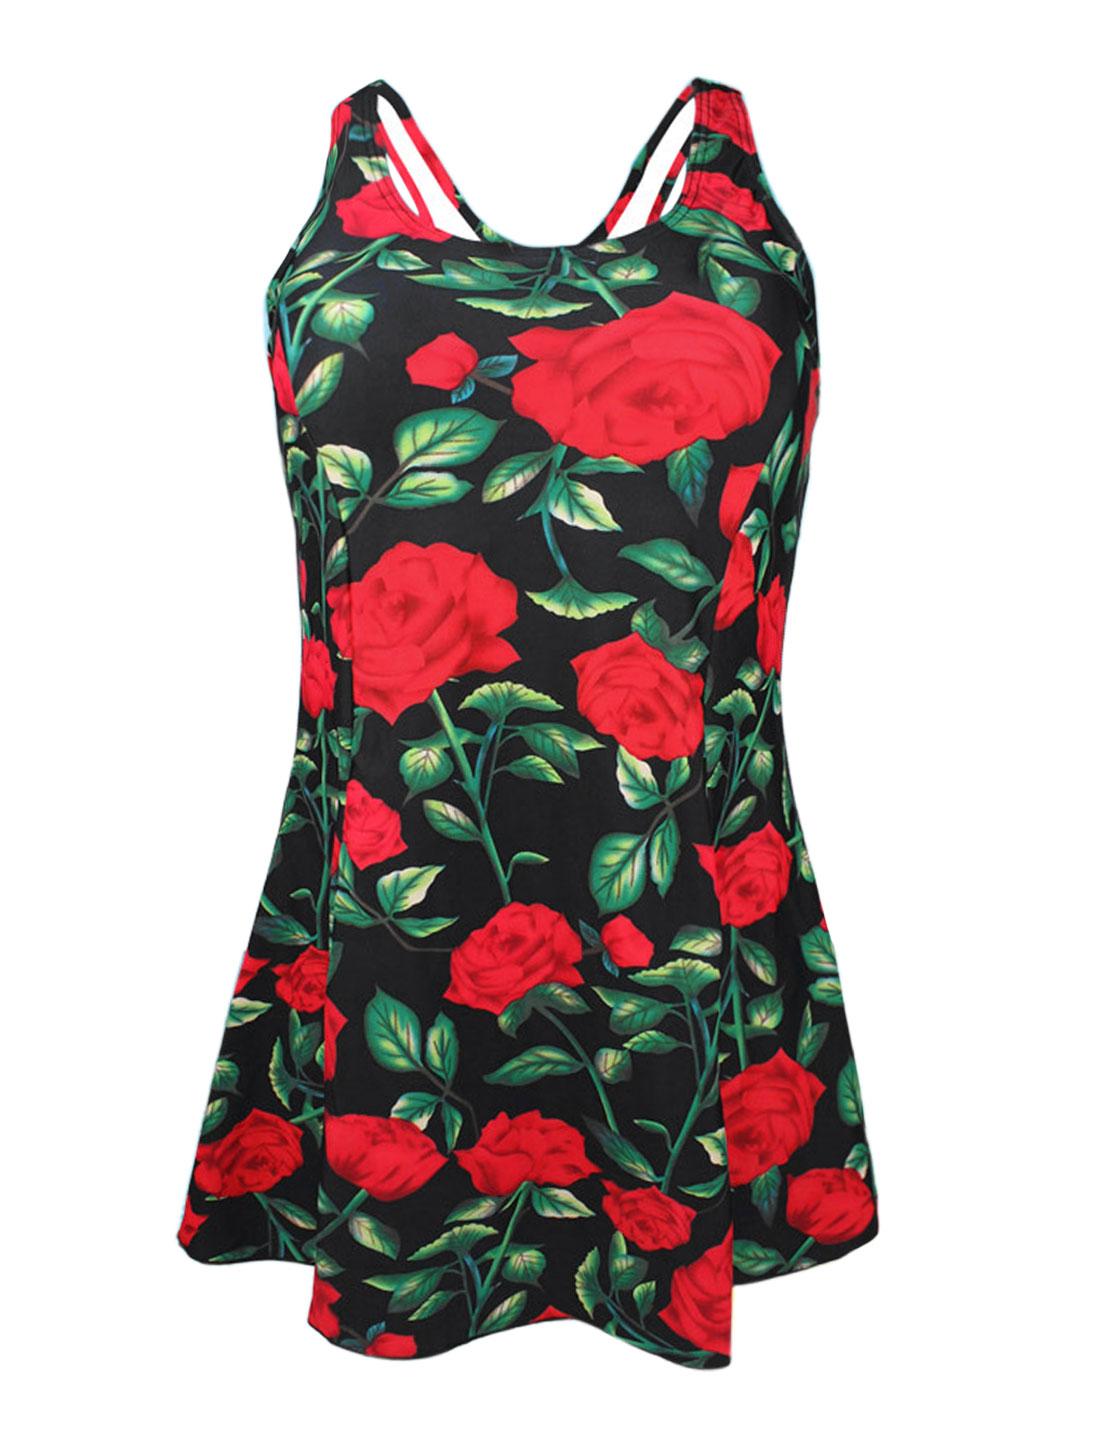 Women Vintage One Piece Floral Print Slim Bathing Suit Swimsuit Swimdress US 8 Cover Up